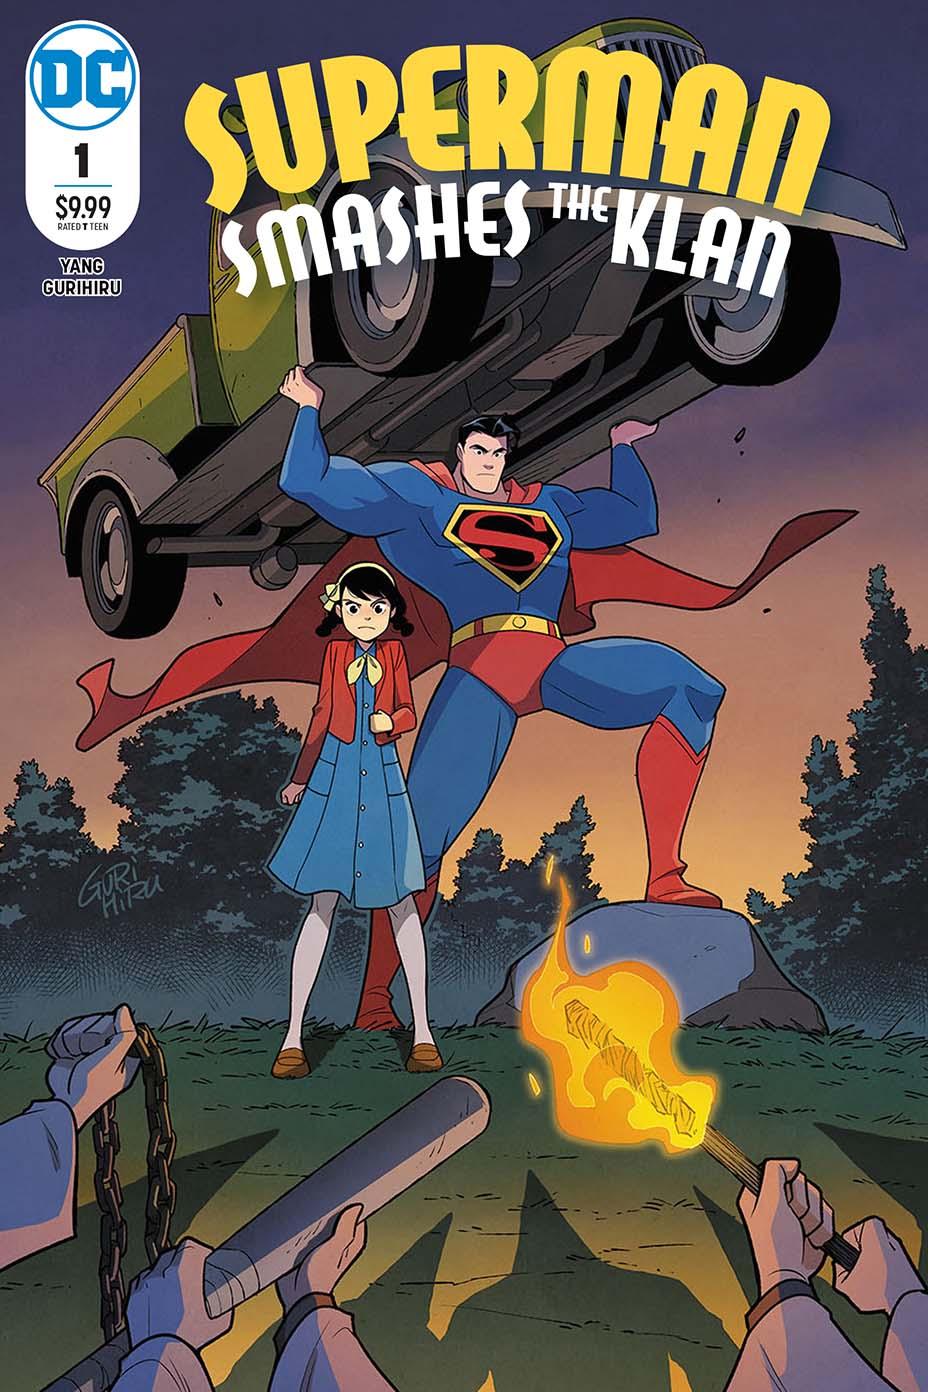 Superman smashes the Klan #1, copertina di Gurihiru